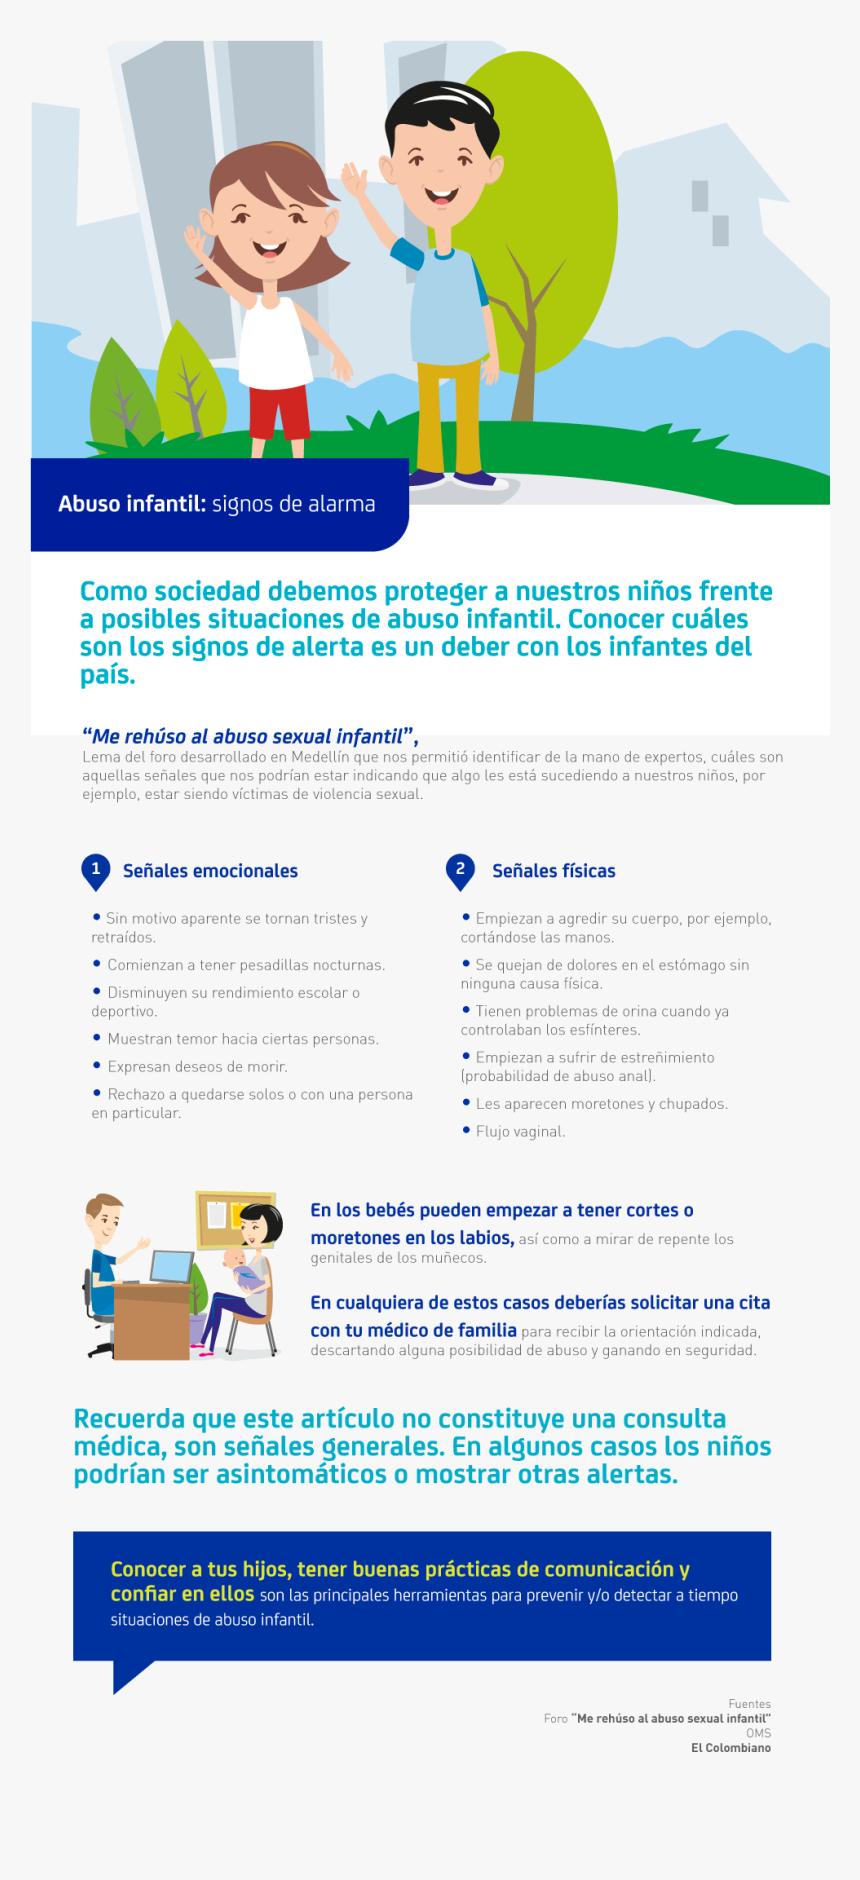 Transparent Signo De Pregunta Png - Online Advertising, Png Download, Free Download